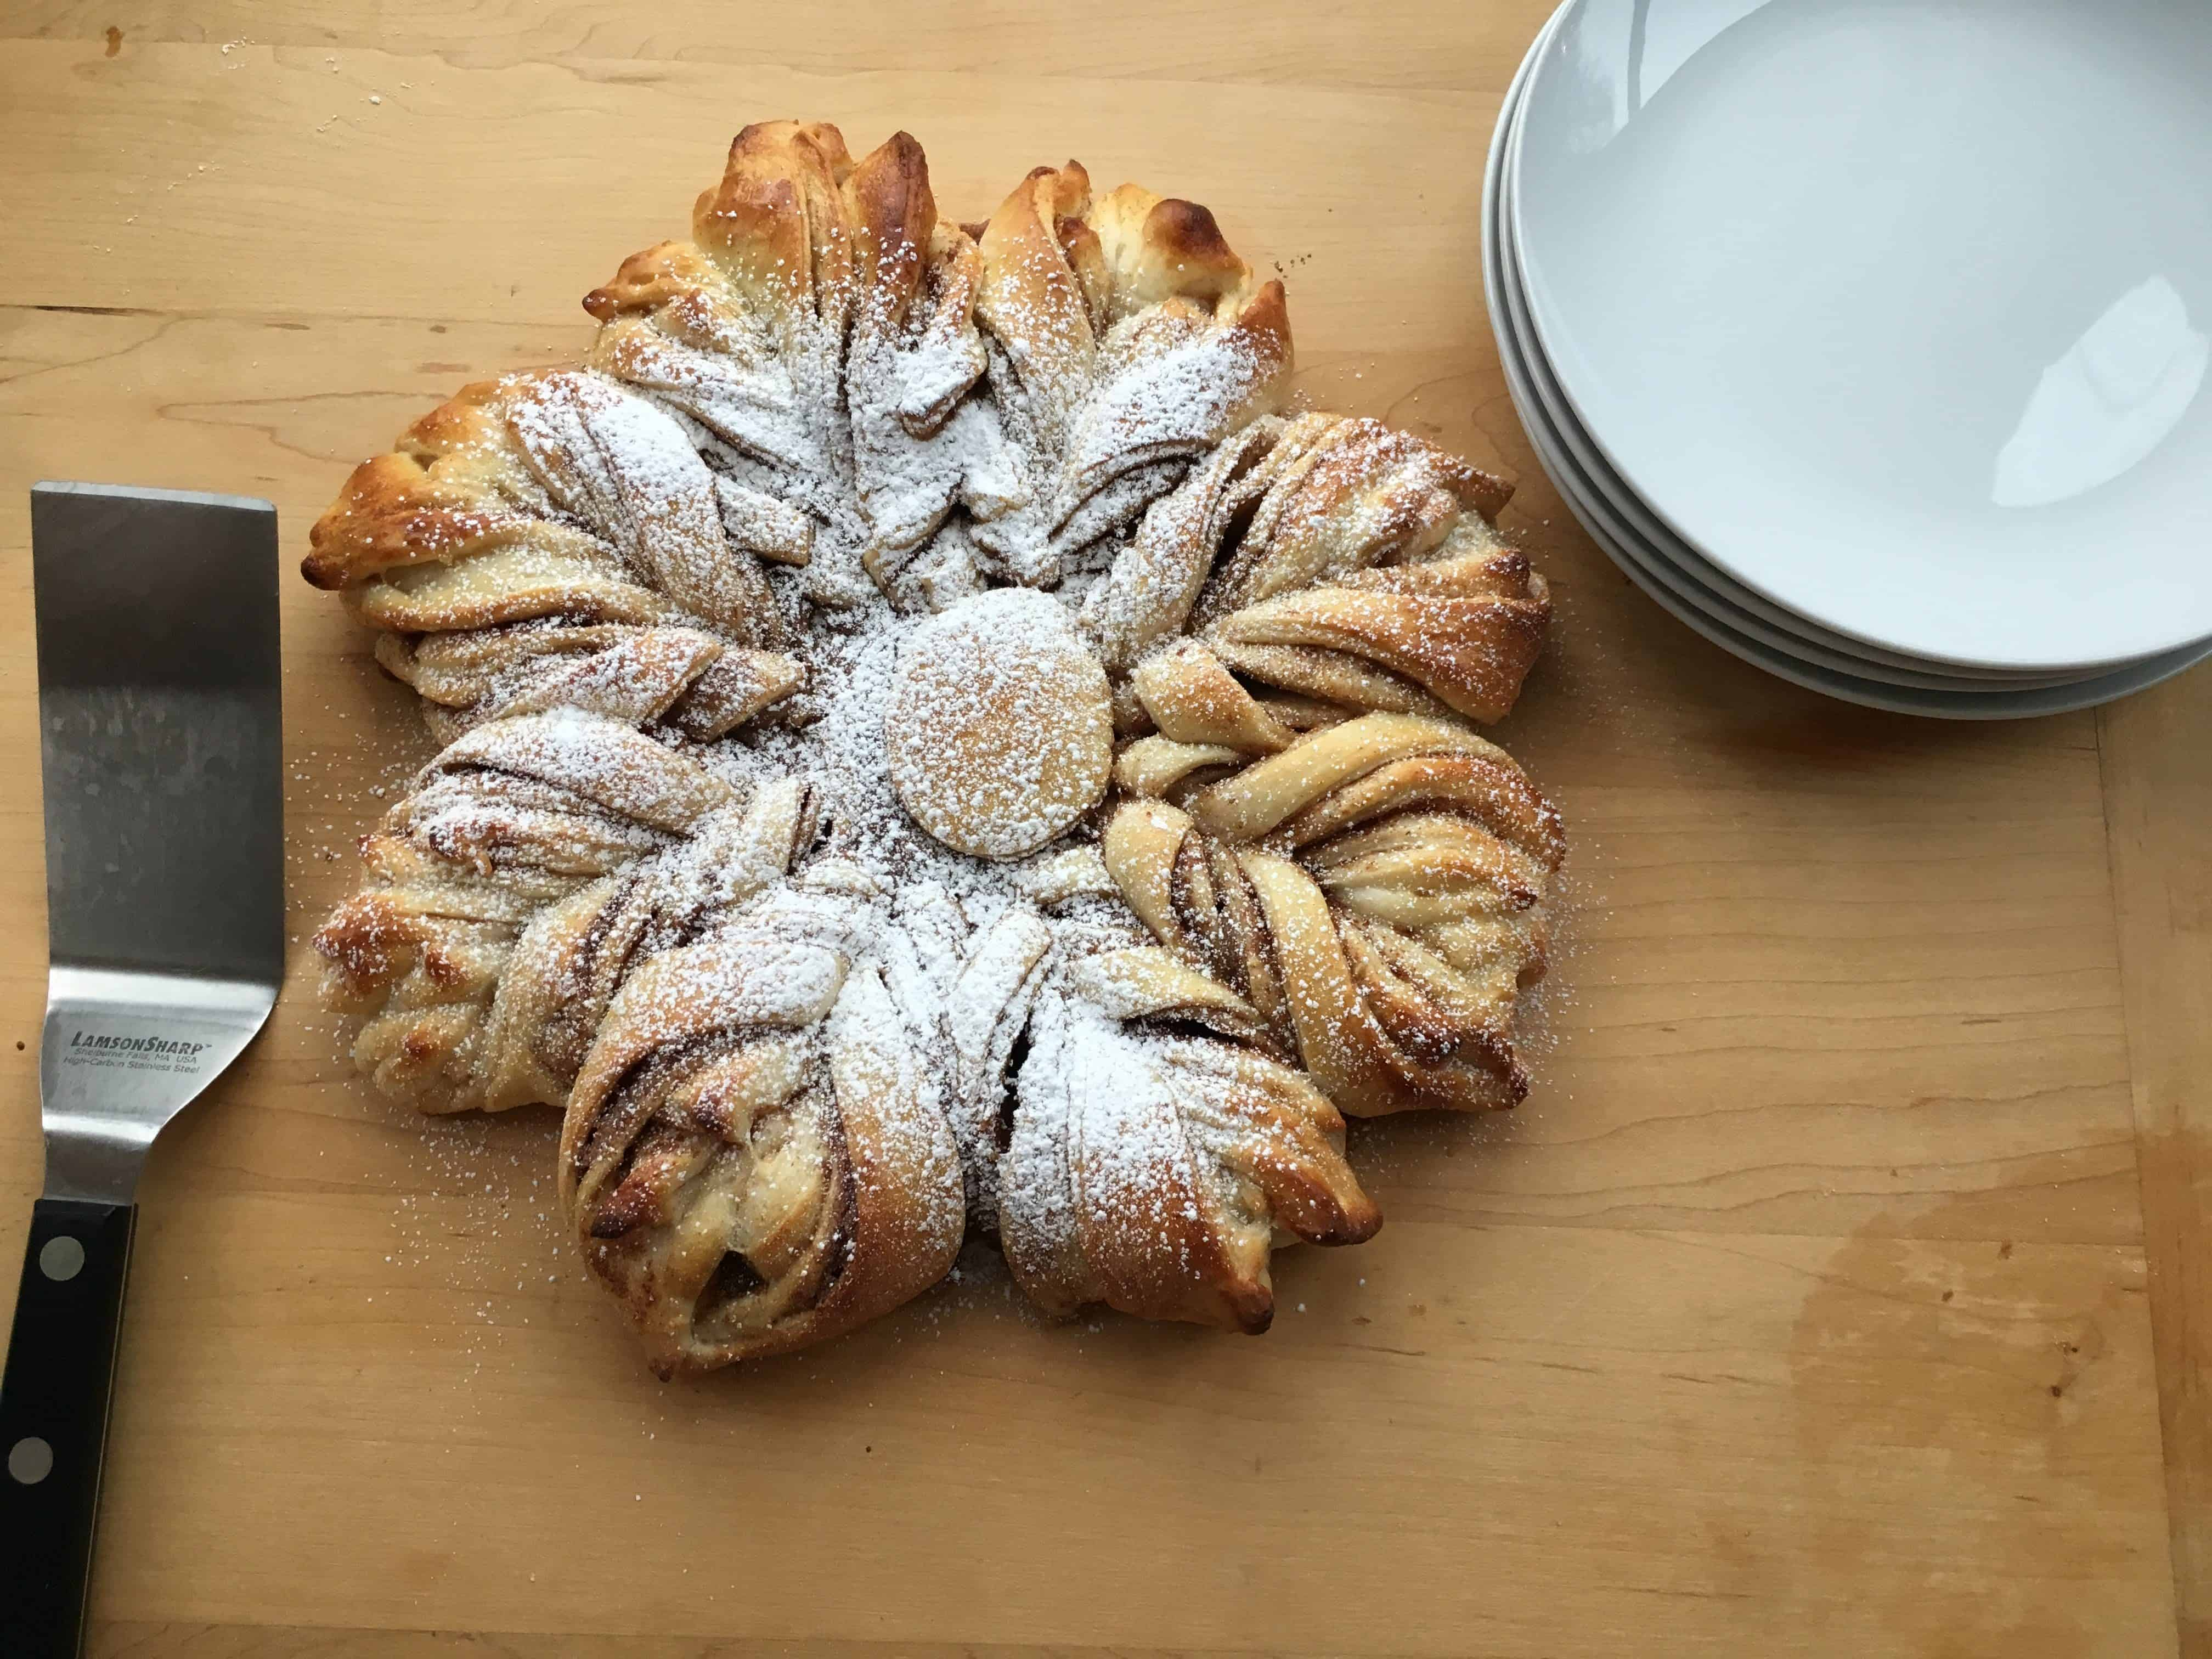 Cinnamon Star Bread on table